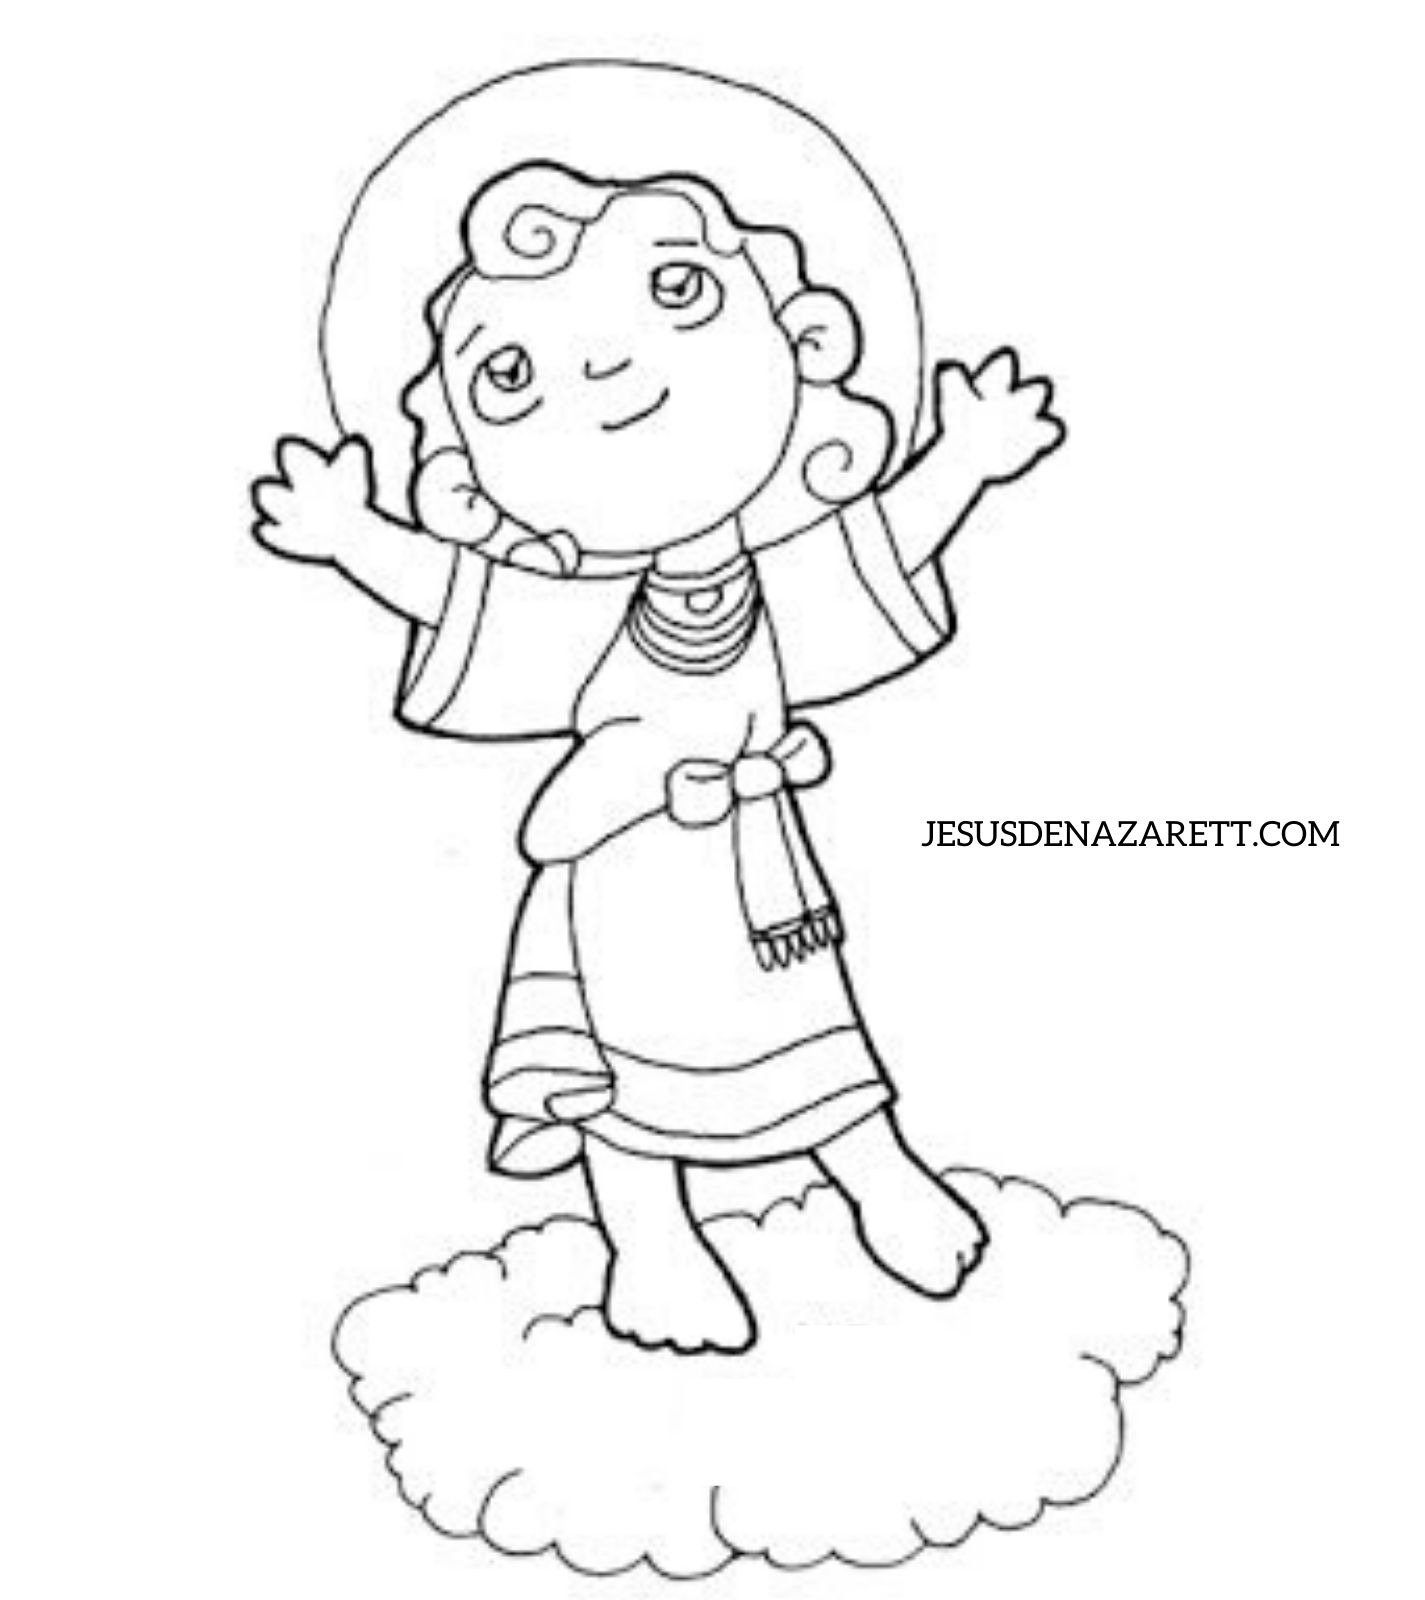 Dibujos De Jesus De Nazaret Para Colorear Jesusdenazarett Com